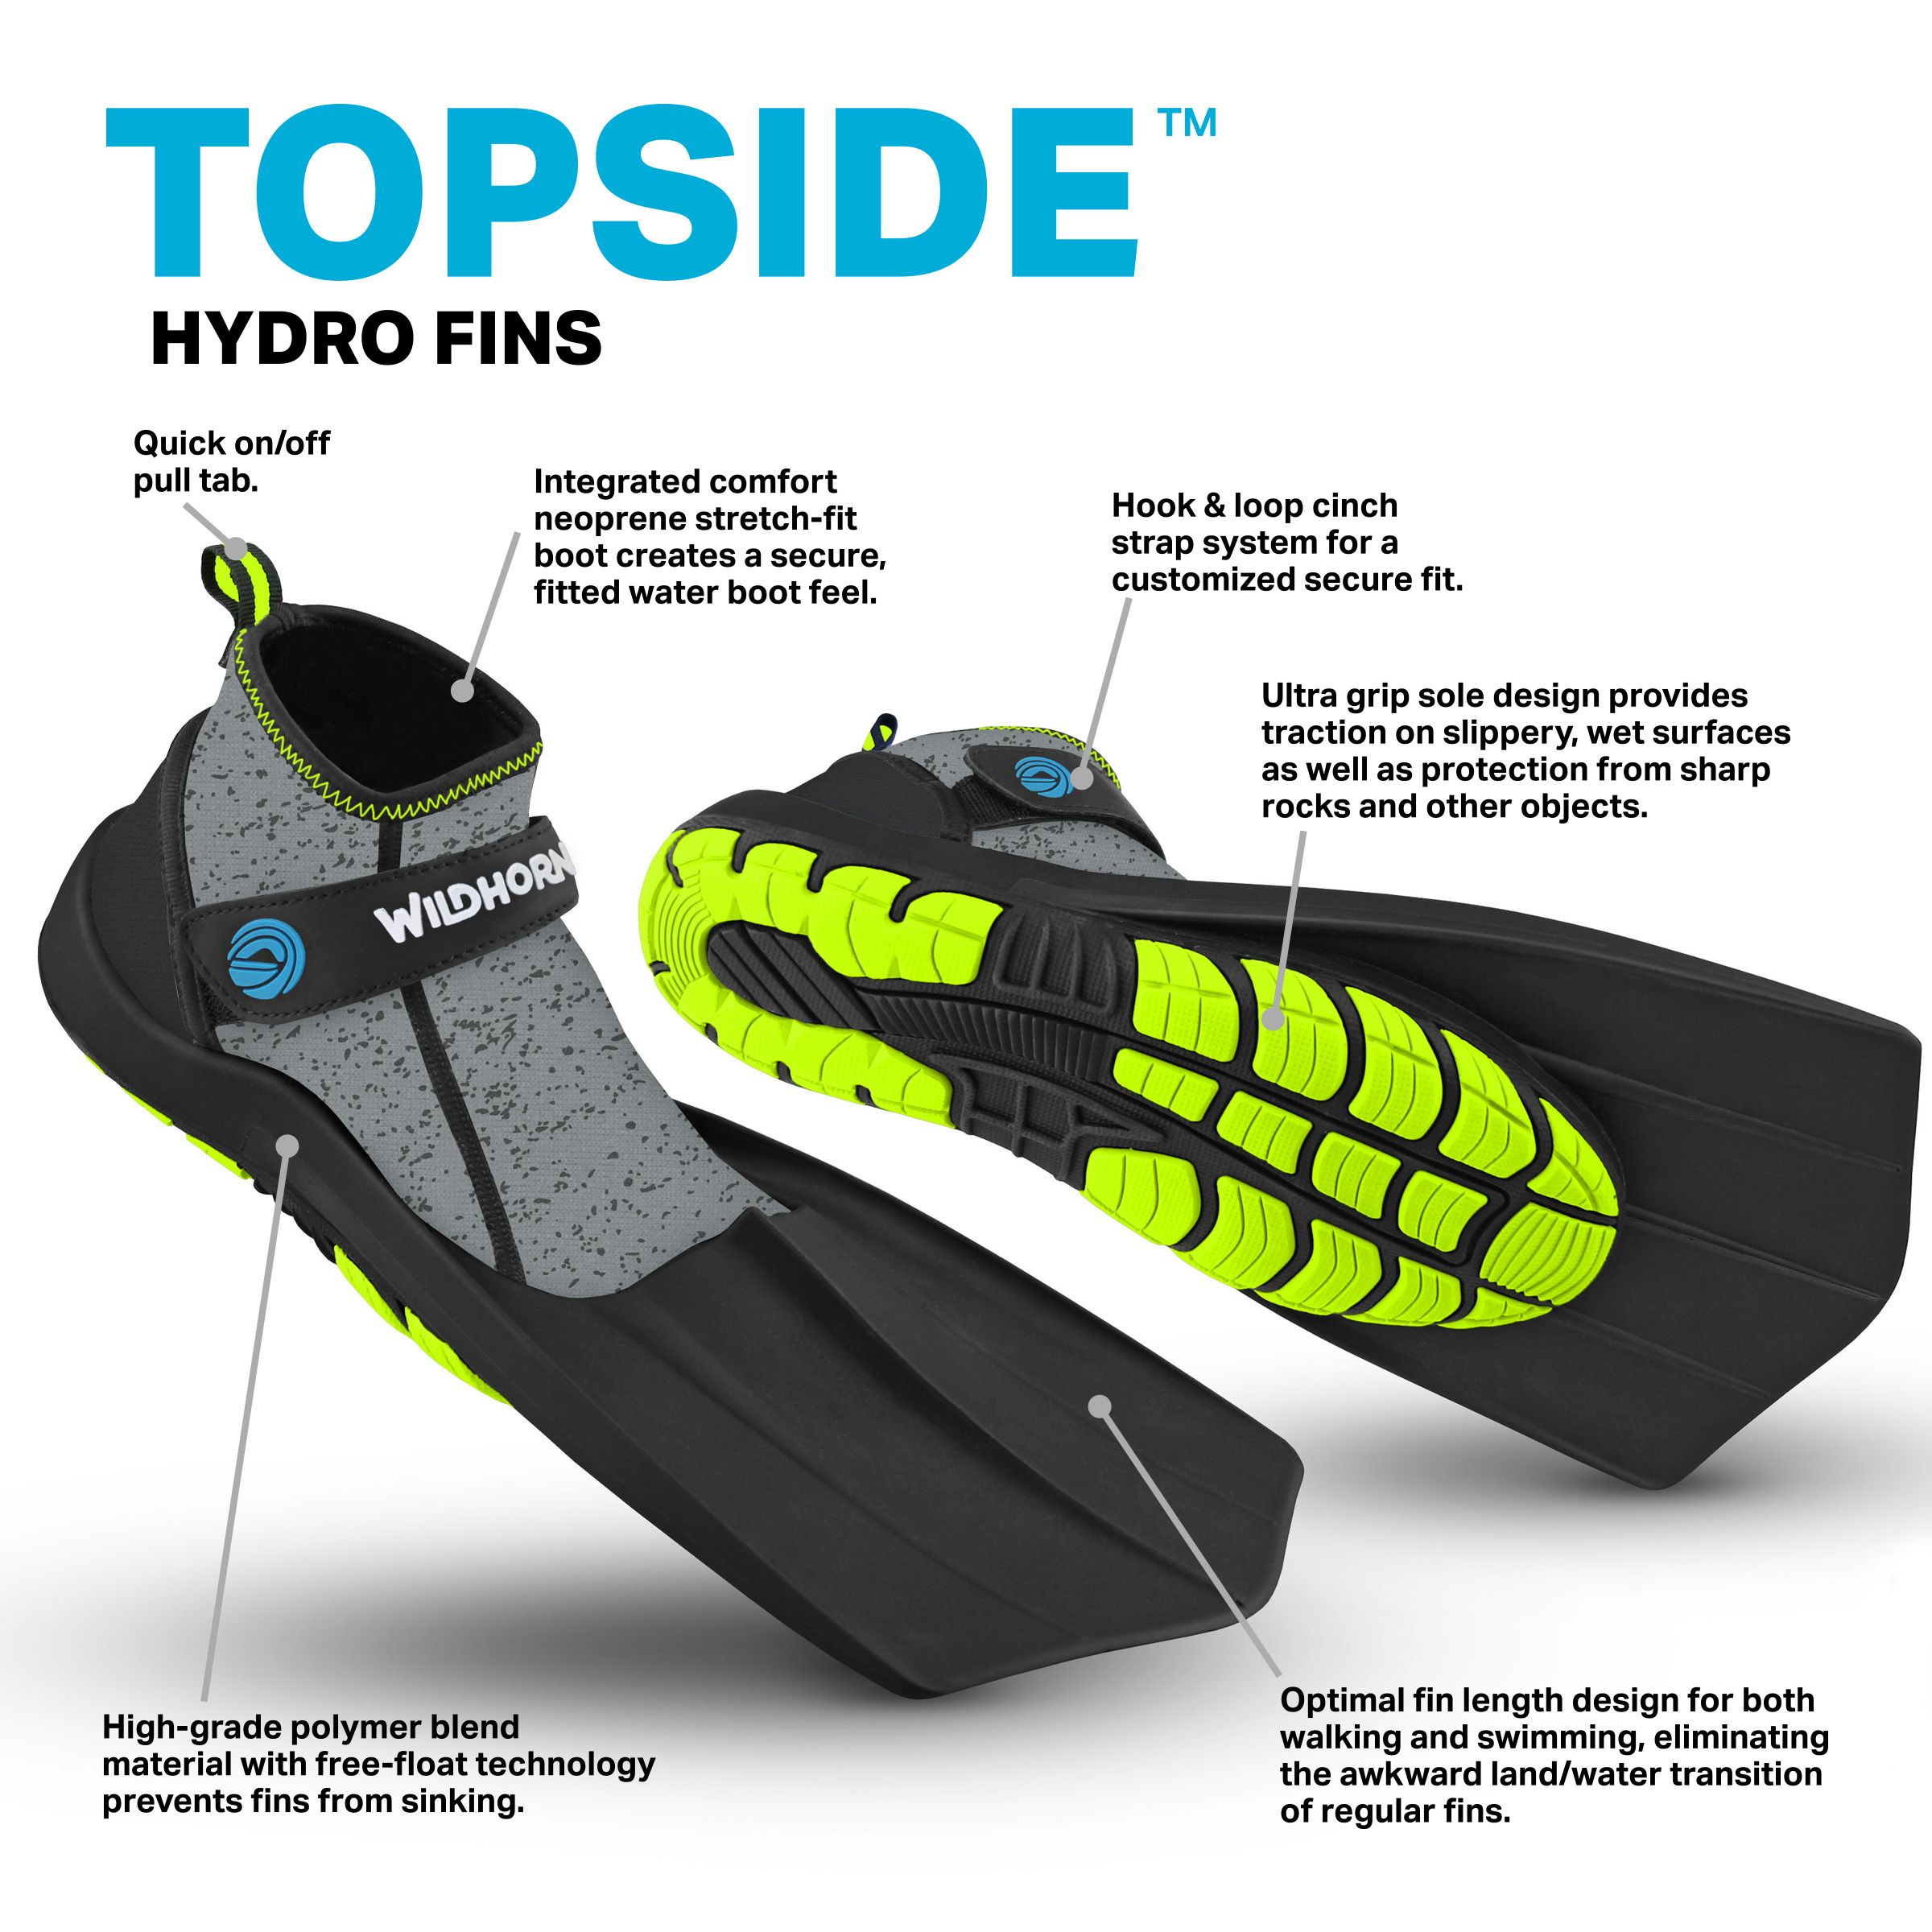 Topside Hydro Fins